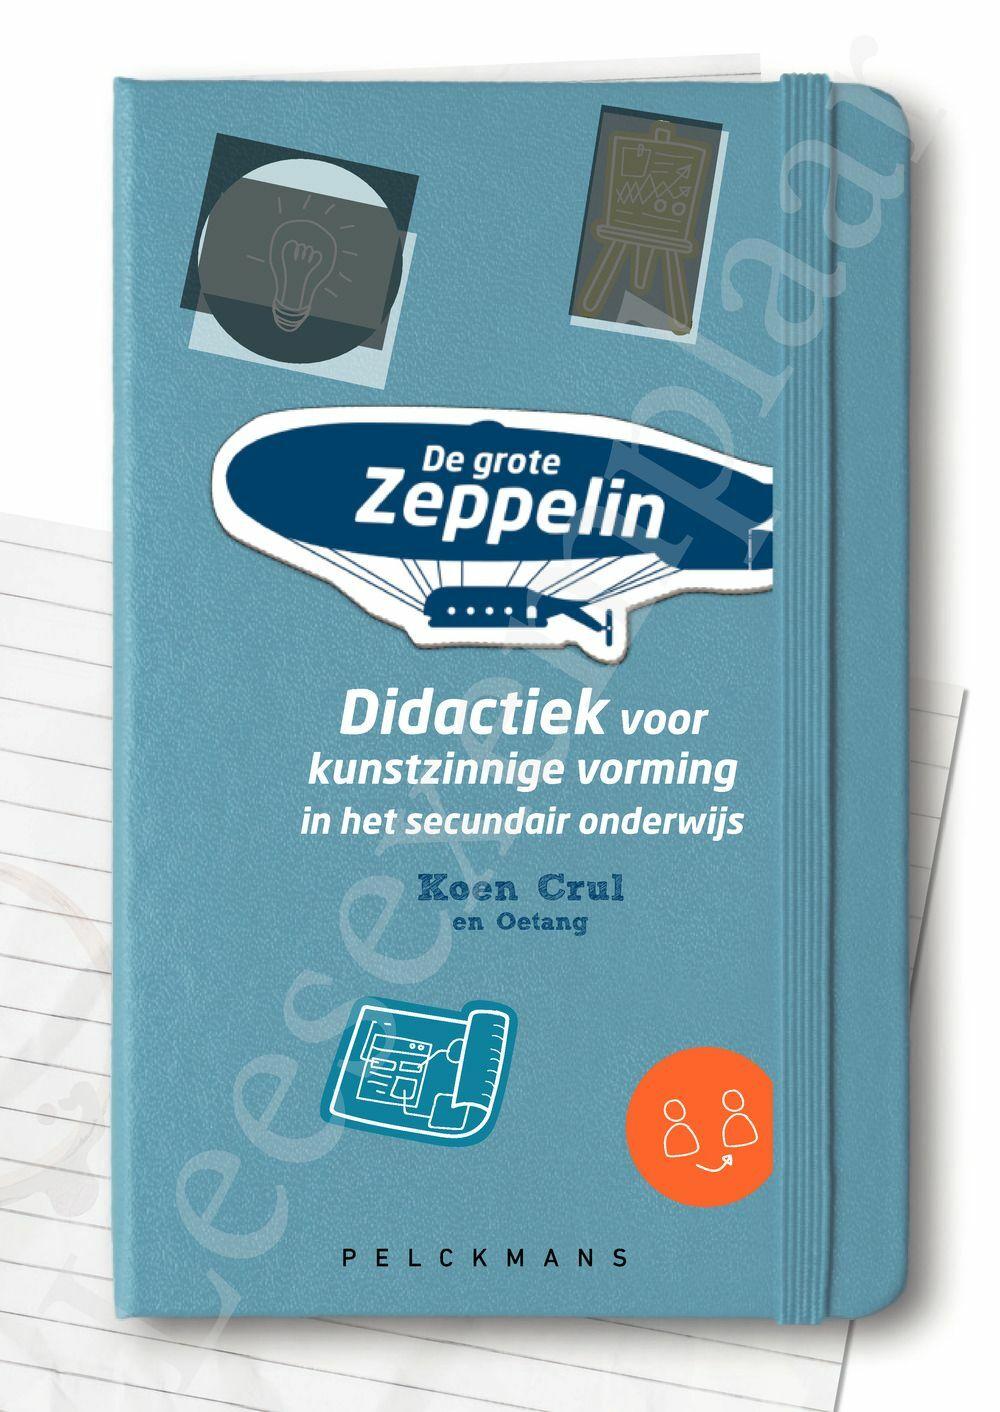 Preview: De grote Zeppelin